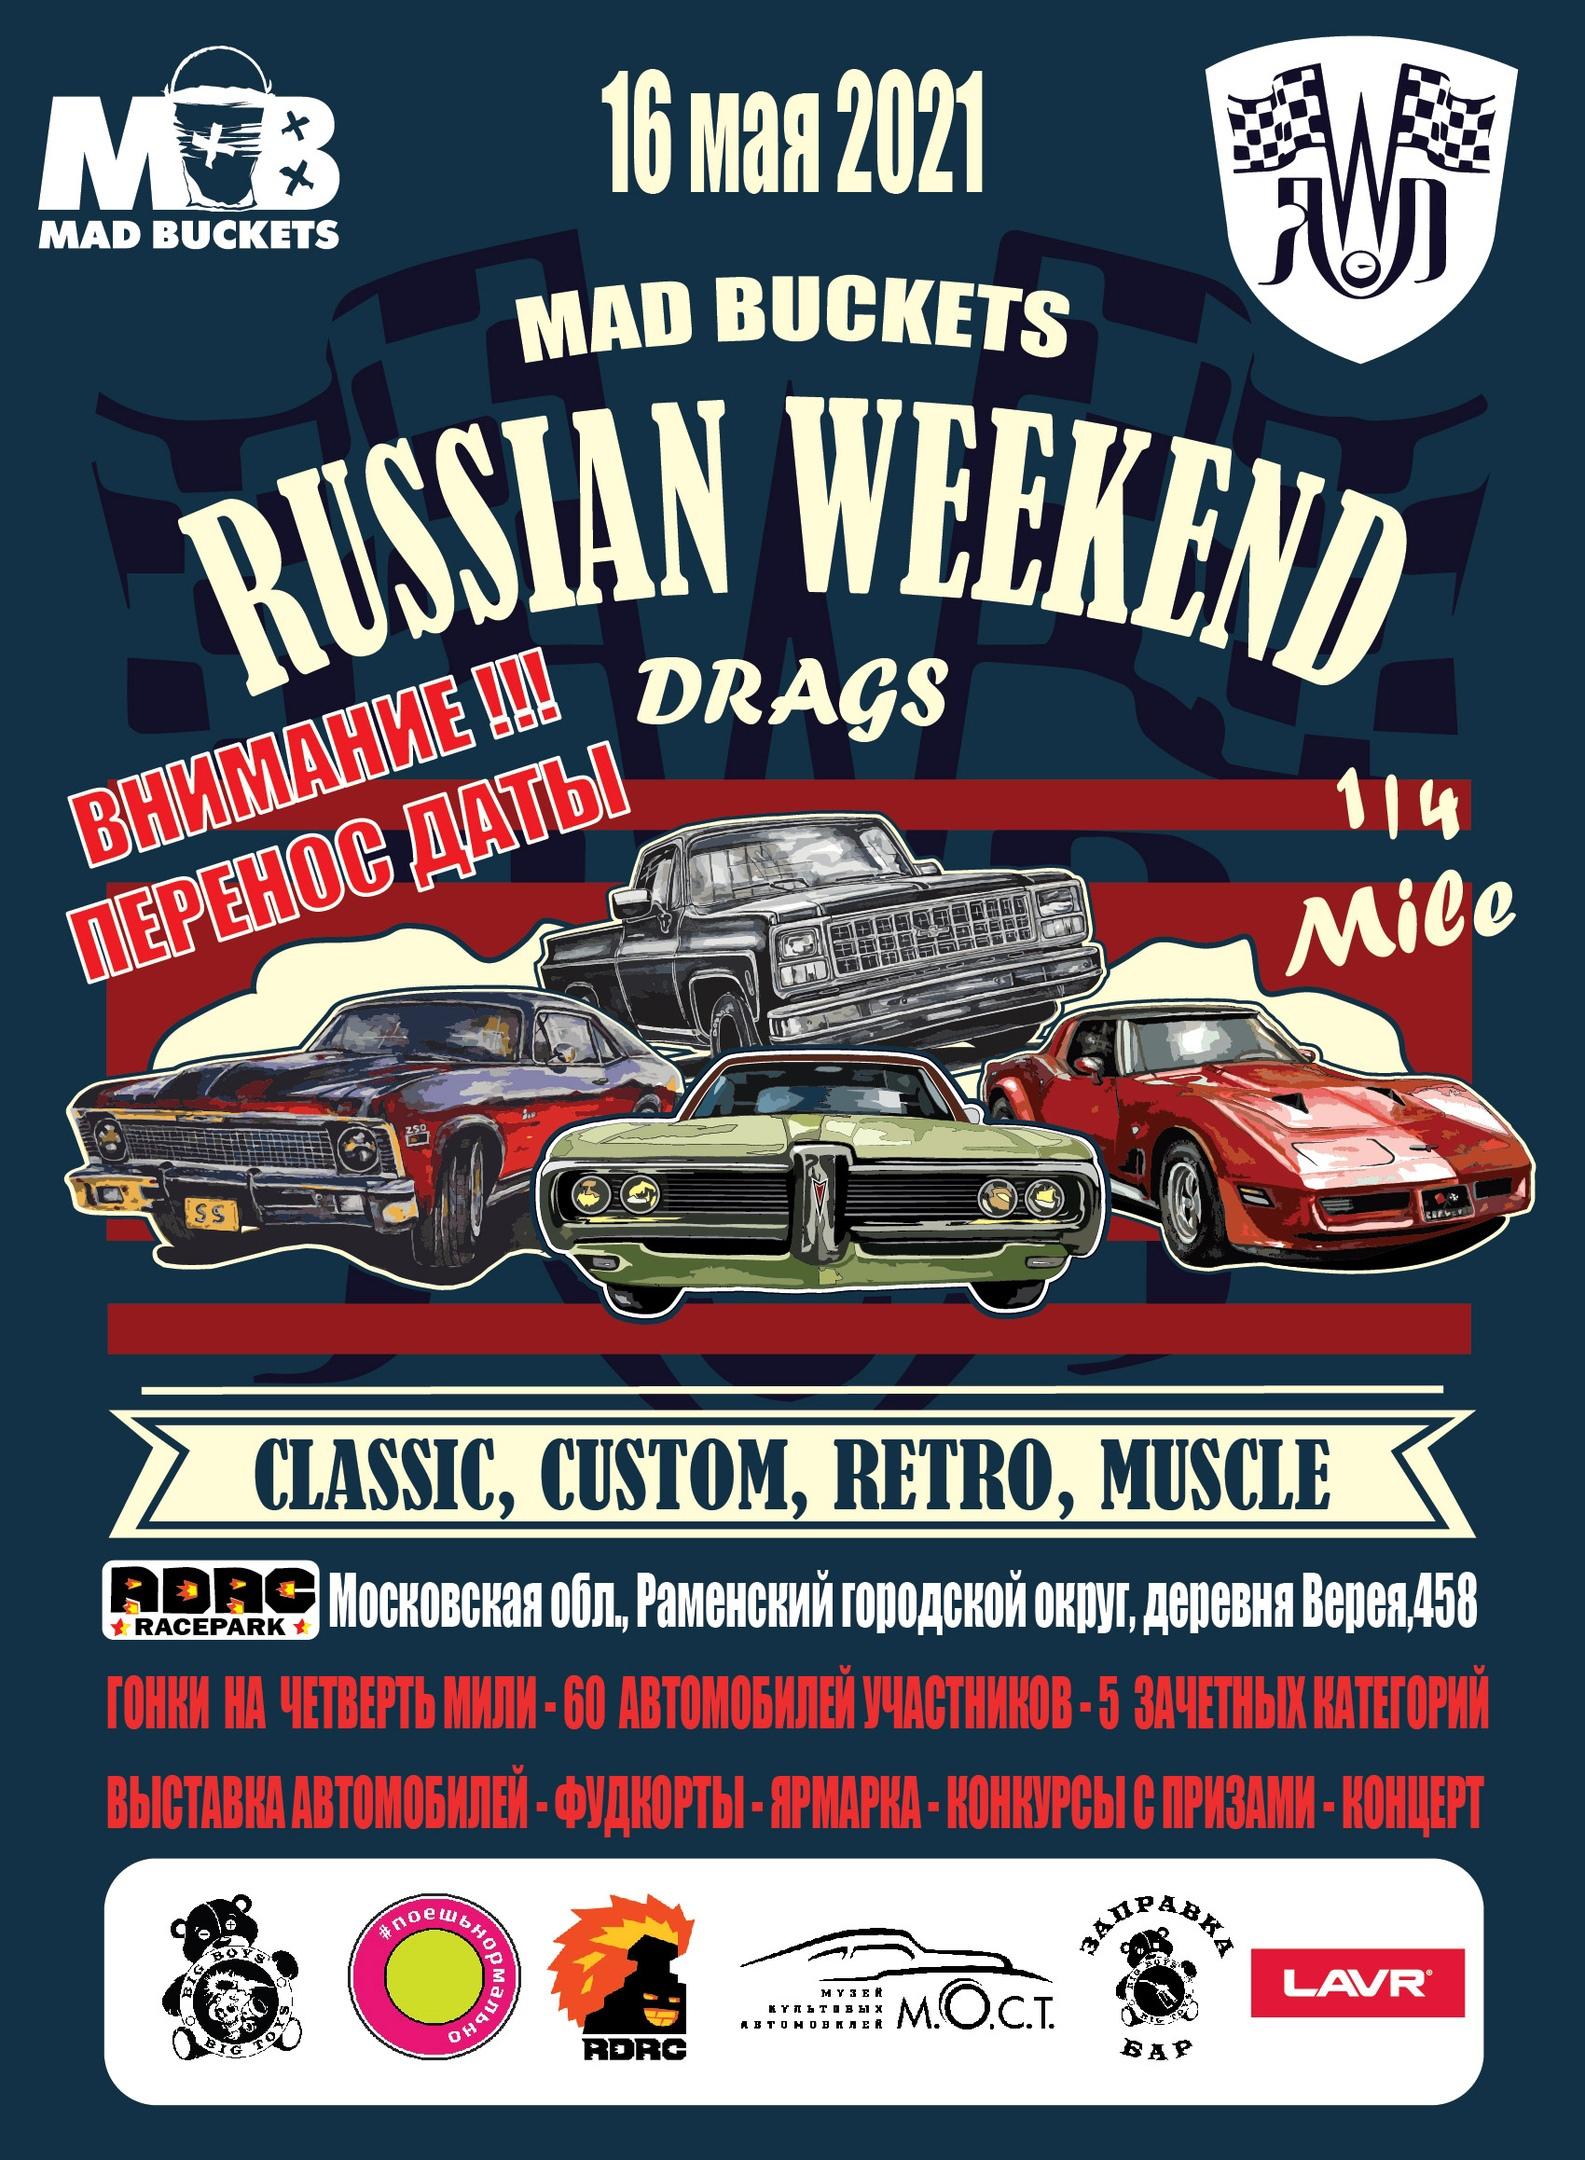 16.05 Russian Weekend Drags!